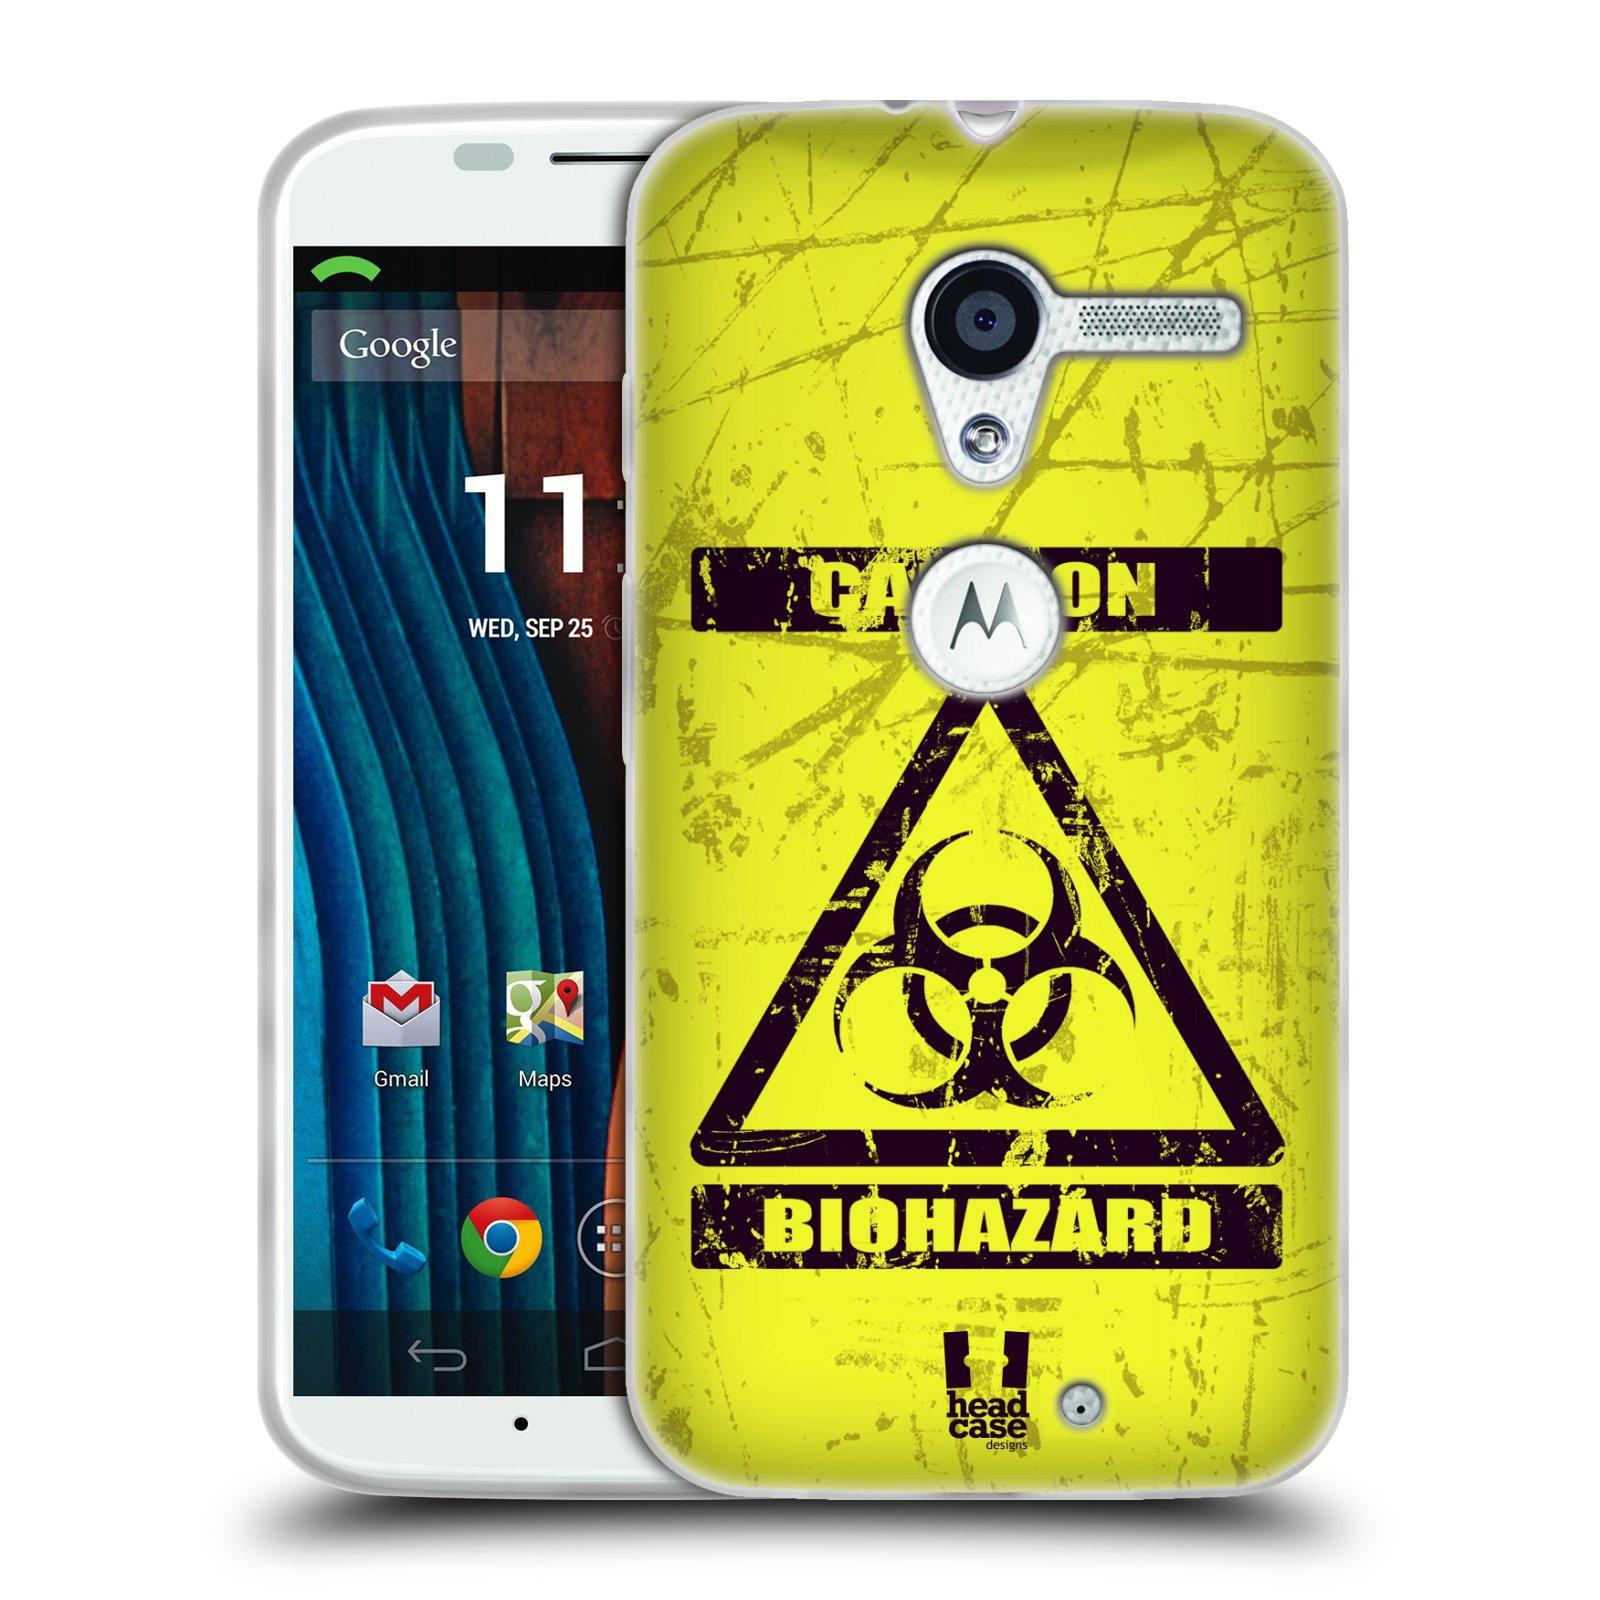 Silikonové pouzdro na mobil Motorola Moto X HEAD CASE BIOHAZARD (Silikonový kryt či obal na mobilní telefon Motorola Moto X)